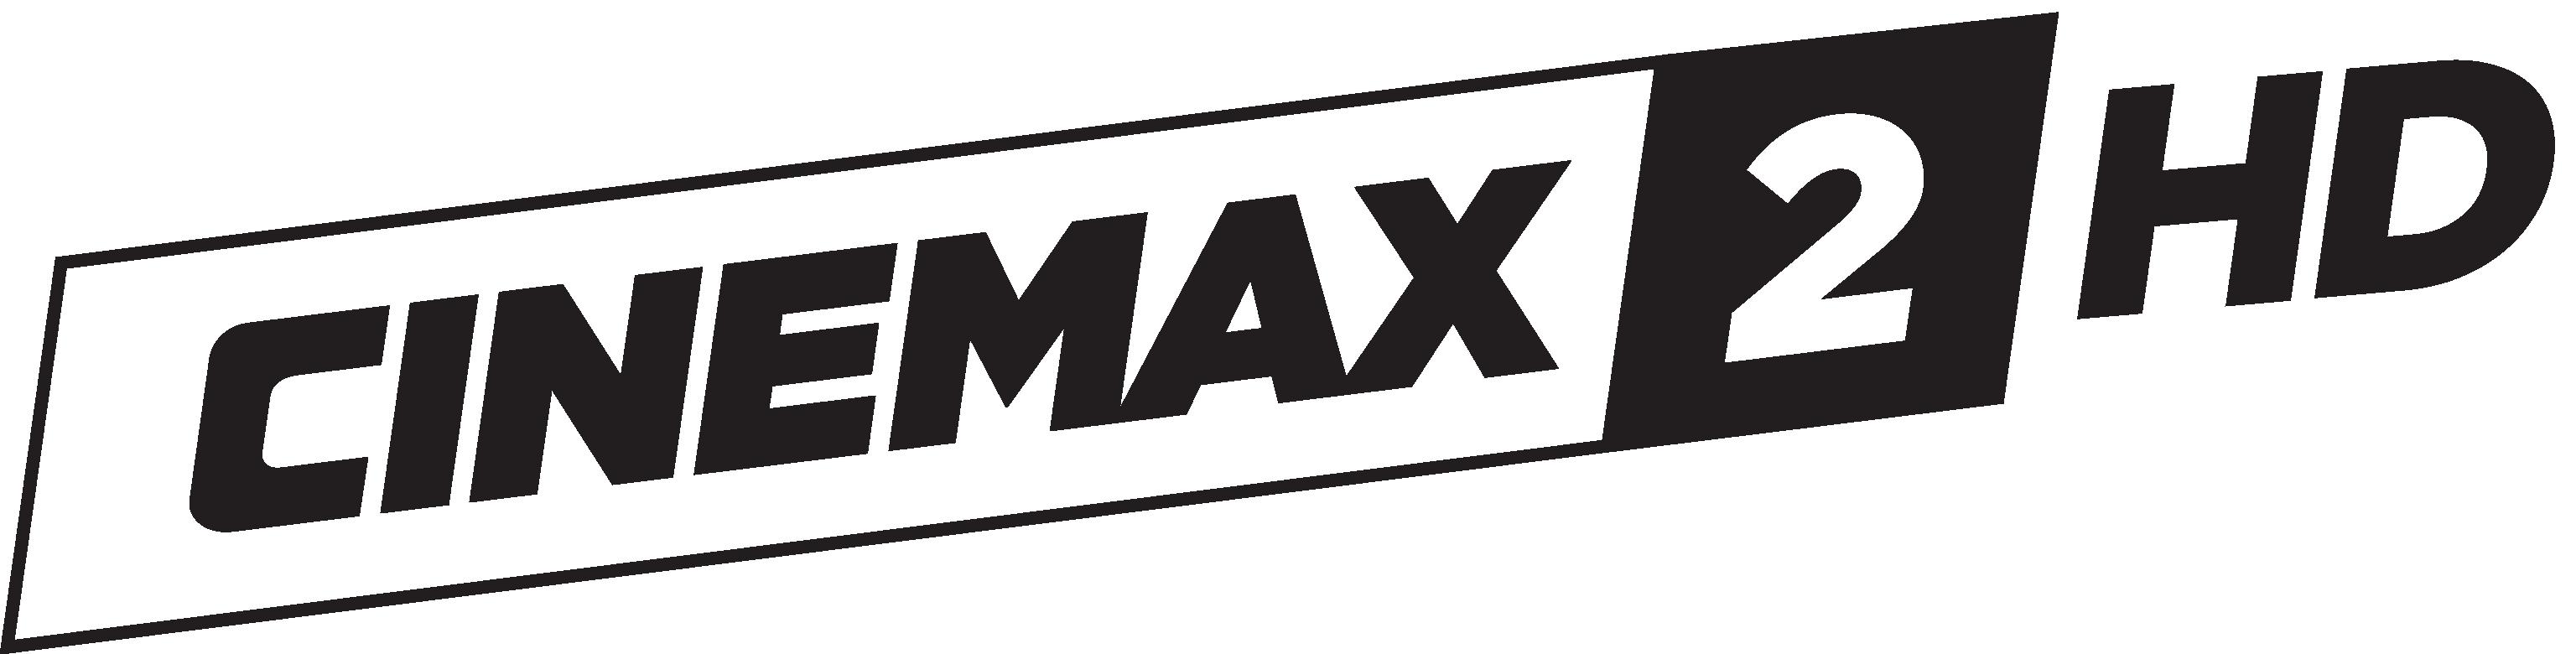 Cinemax 2 HD logo